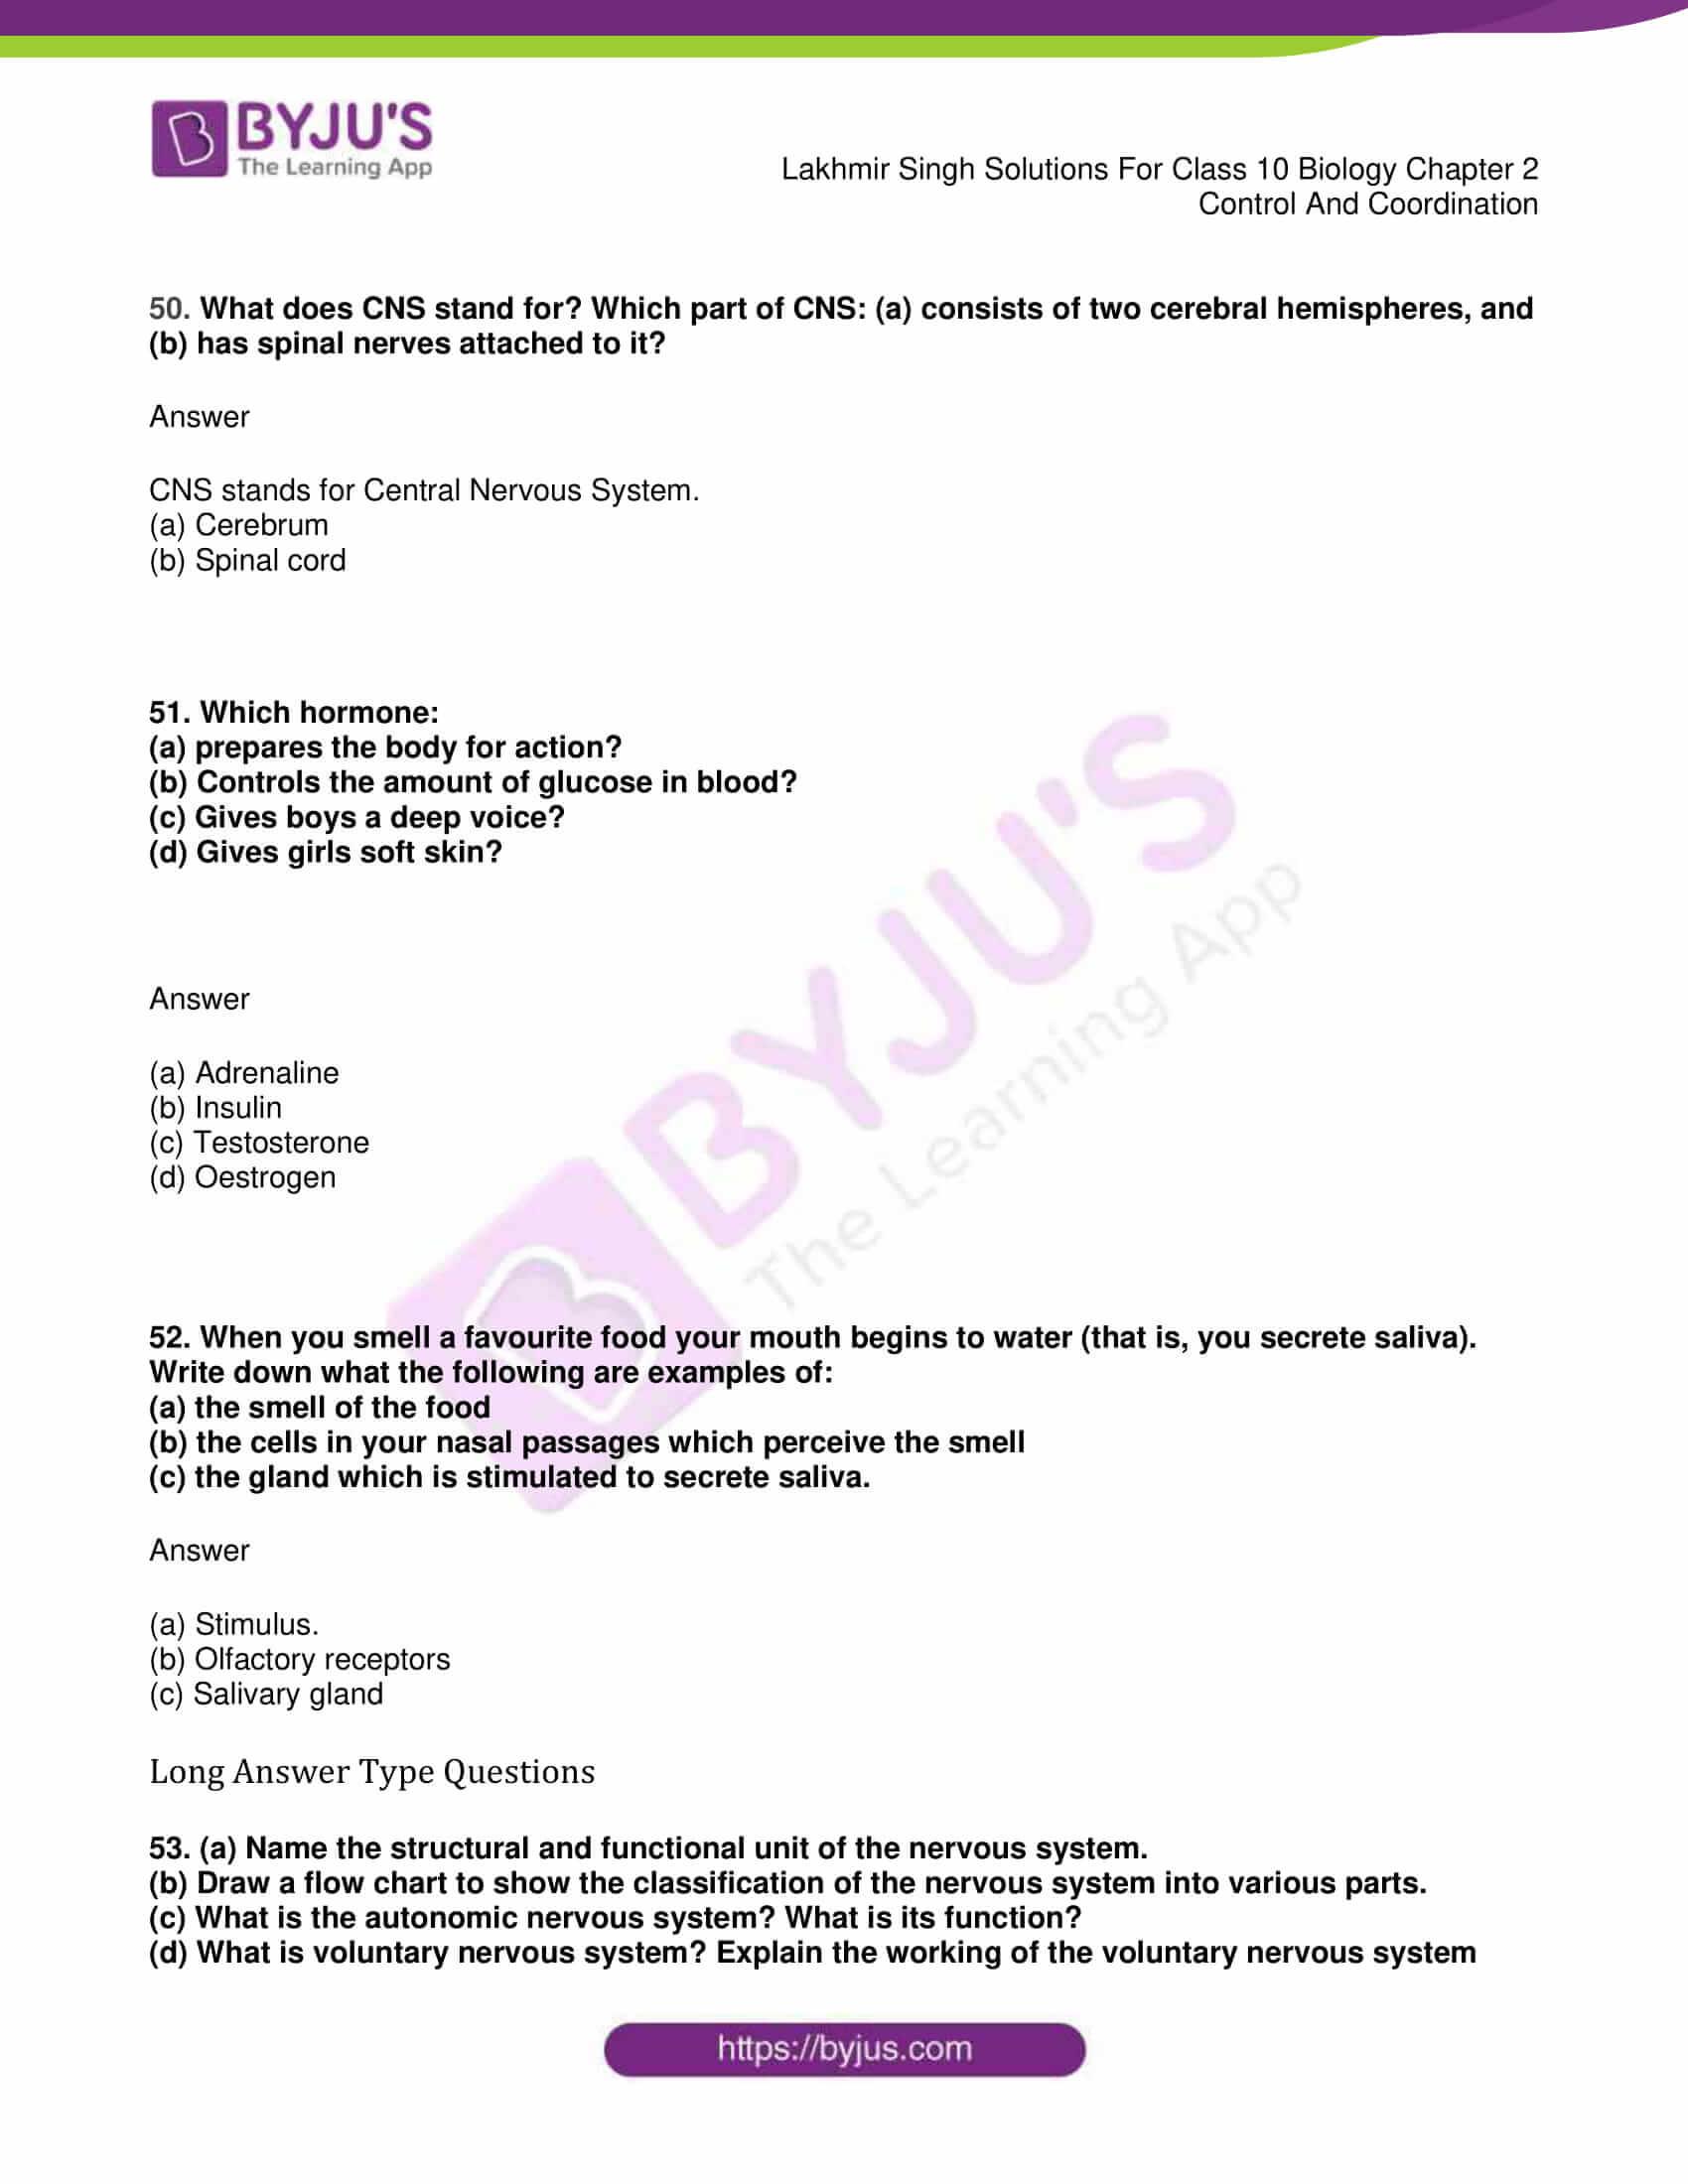 lakhmir singh sol class 10 biology chapter 2 35